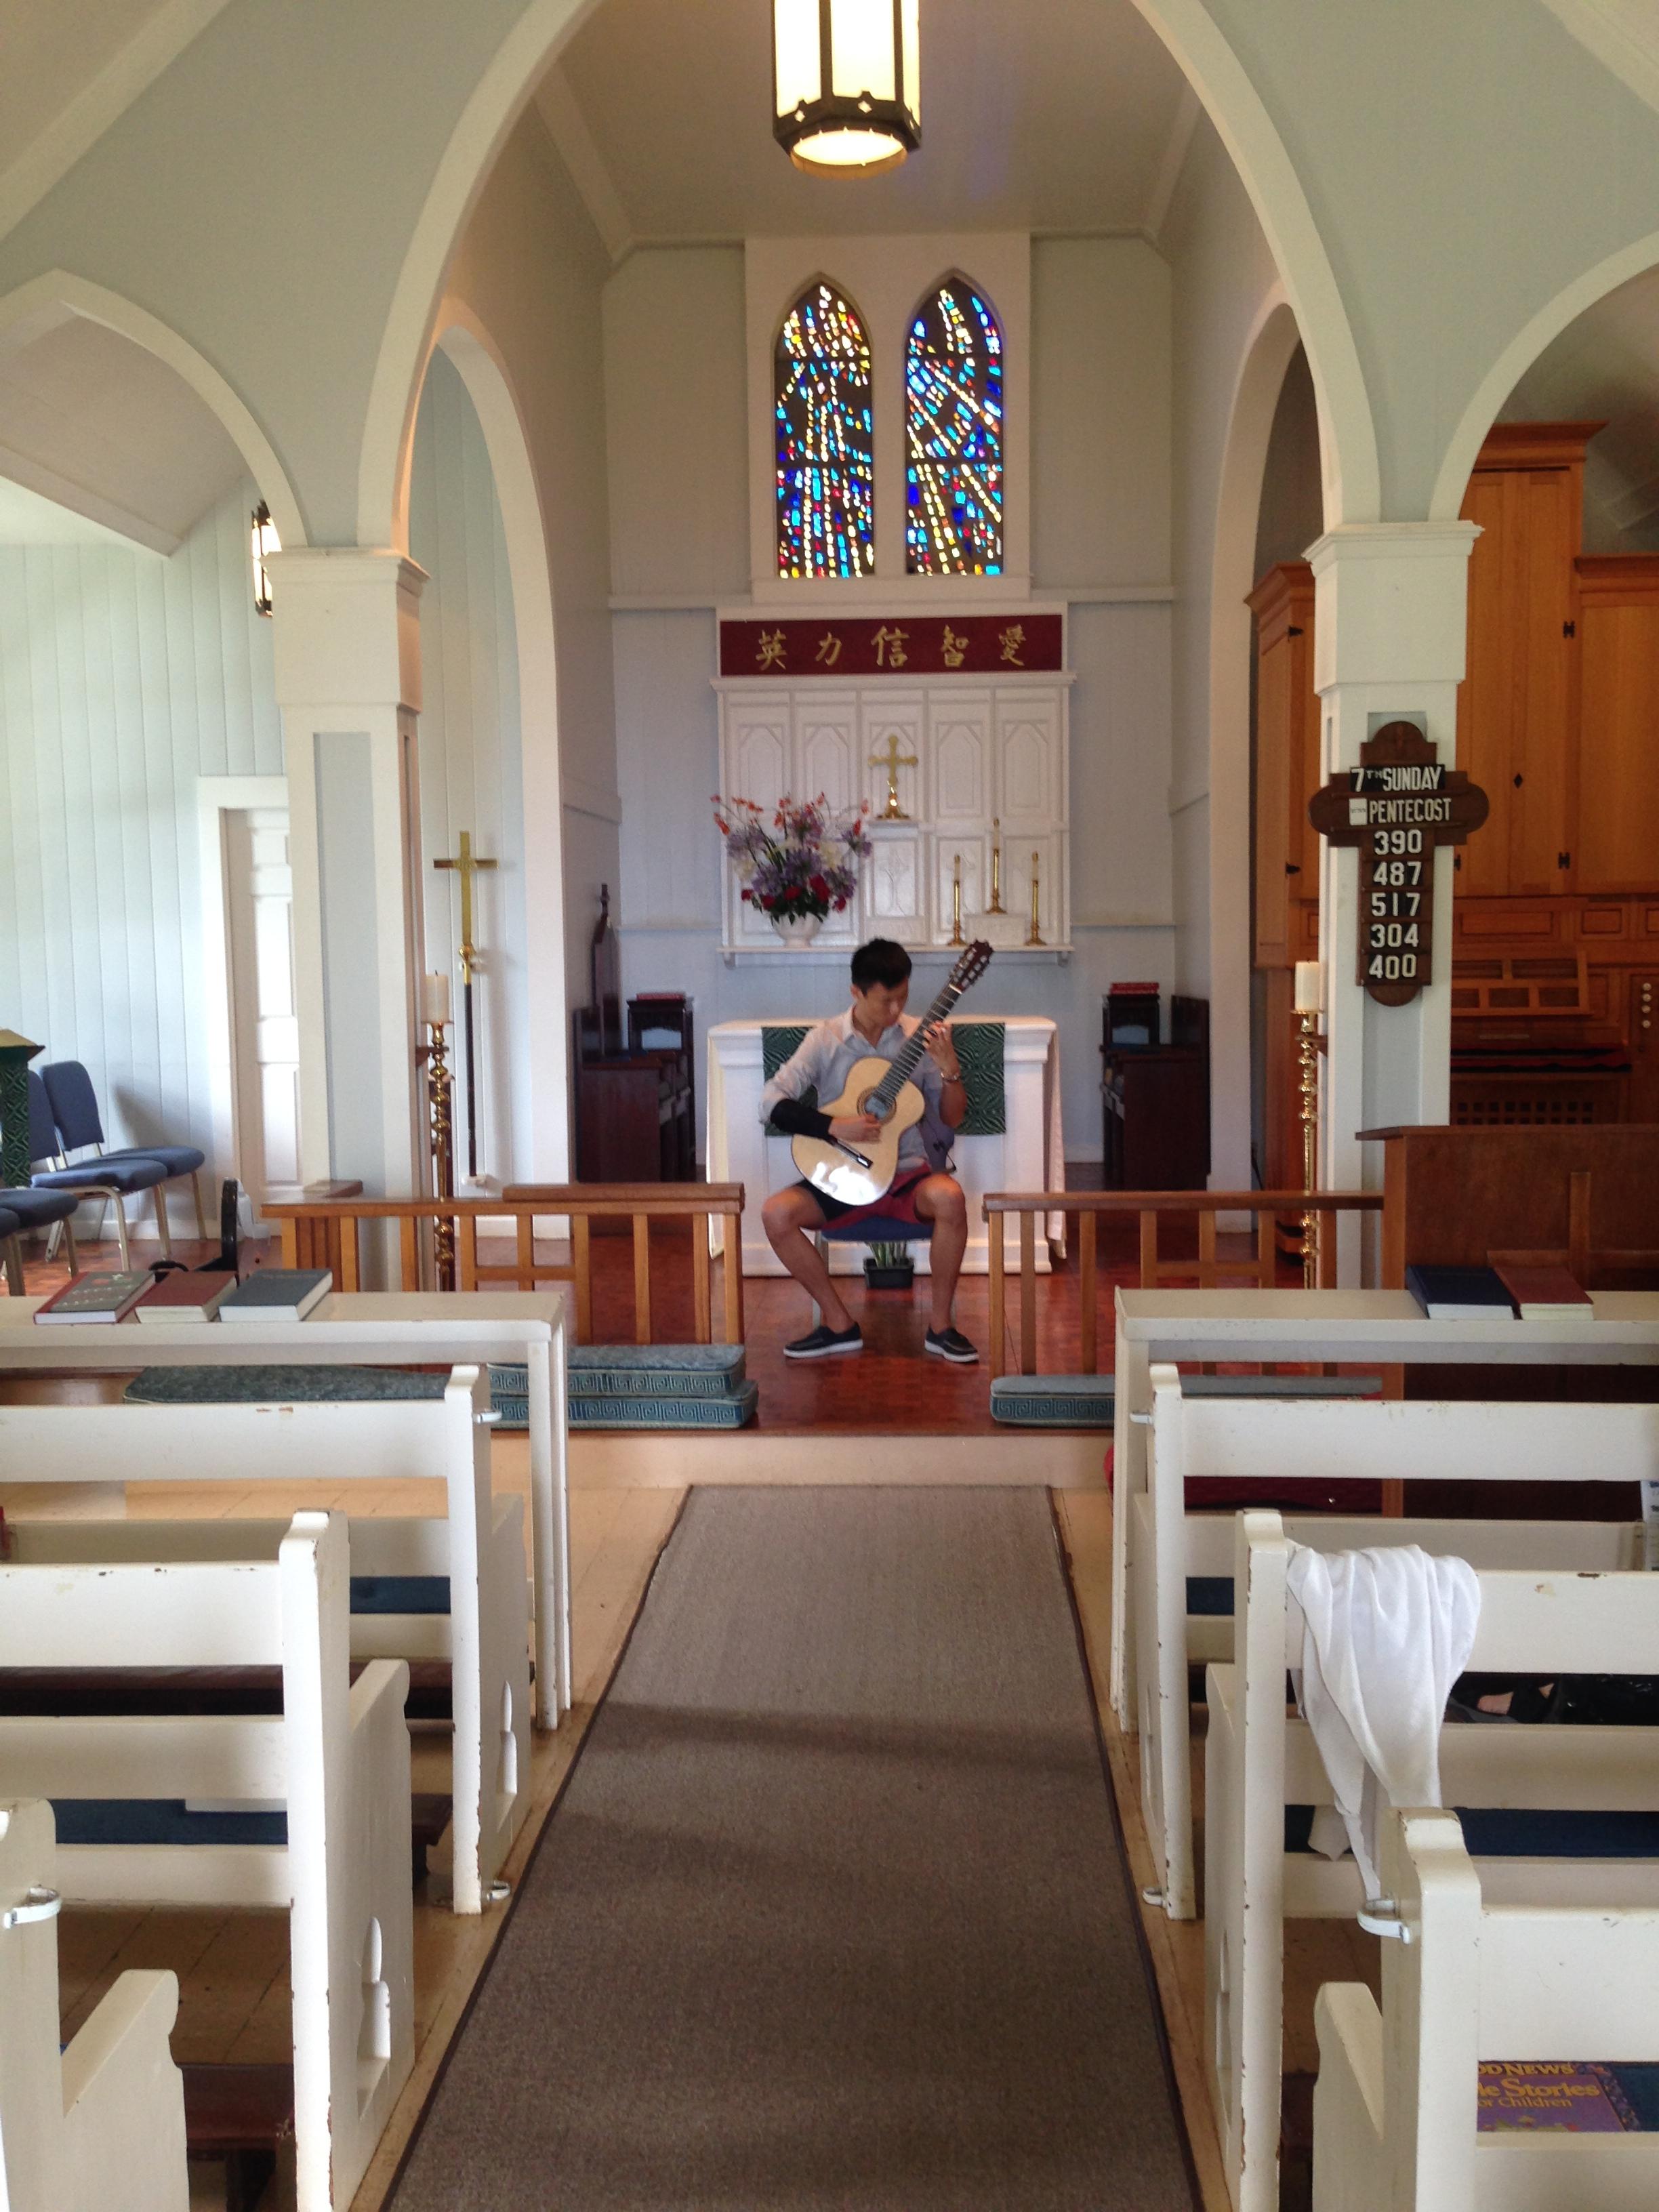 Ray Zhou warming up at St. John's Church, Kula (2014)